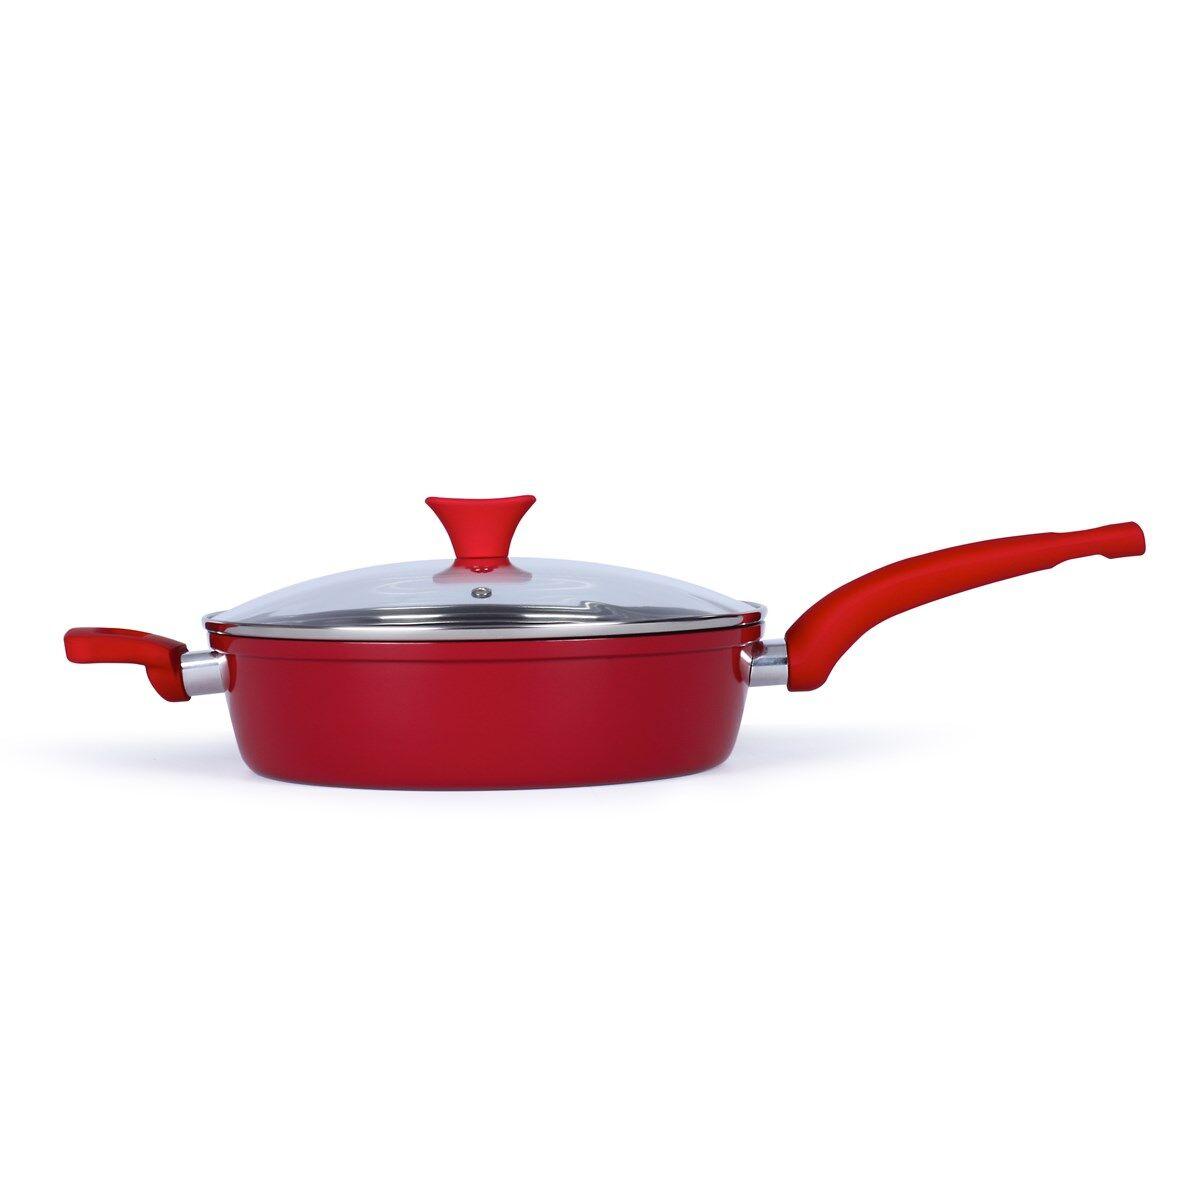 Livoo Sauteuse 26cm en aluminium rouge